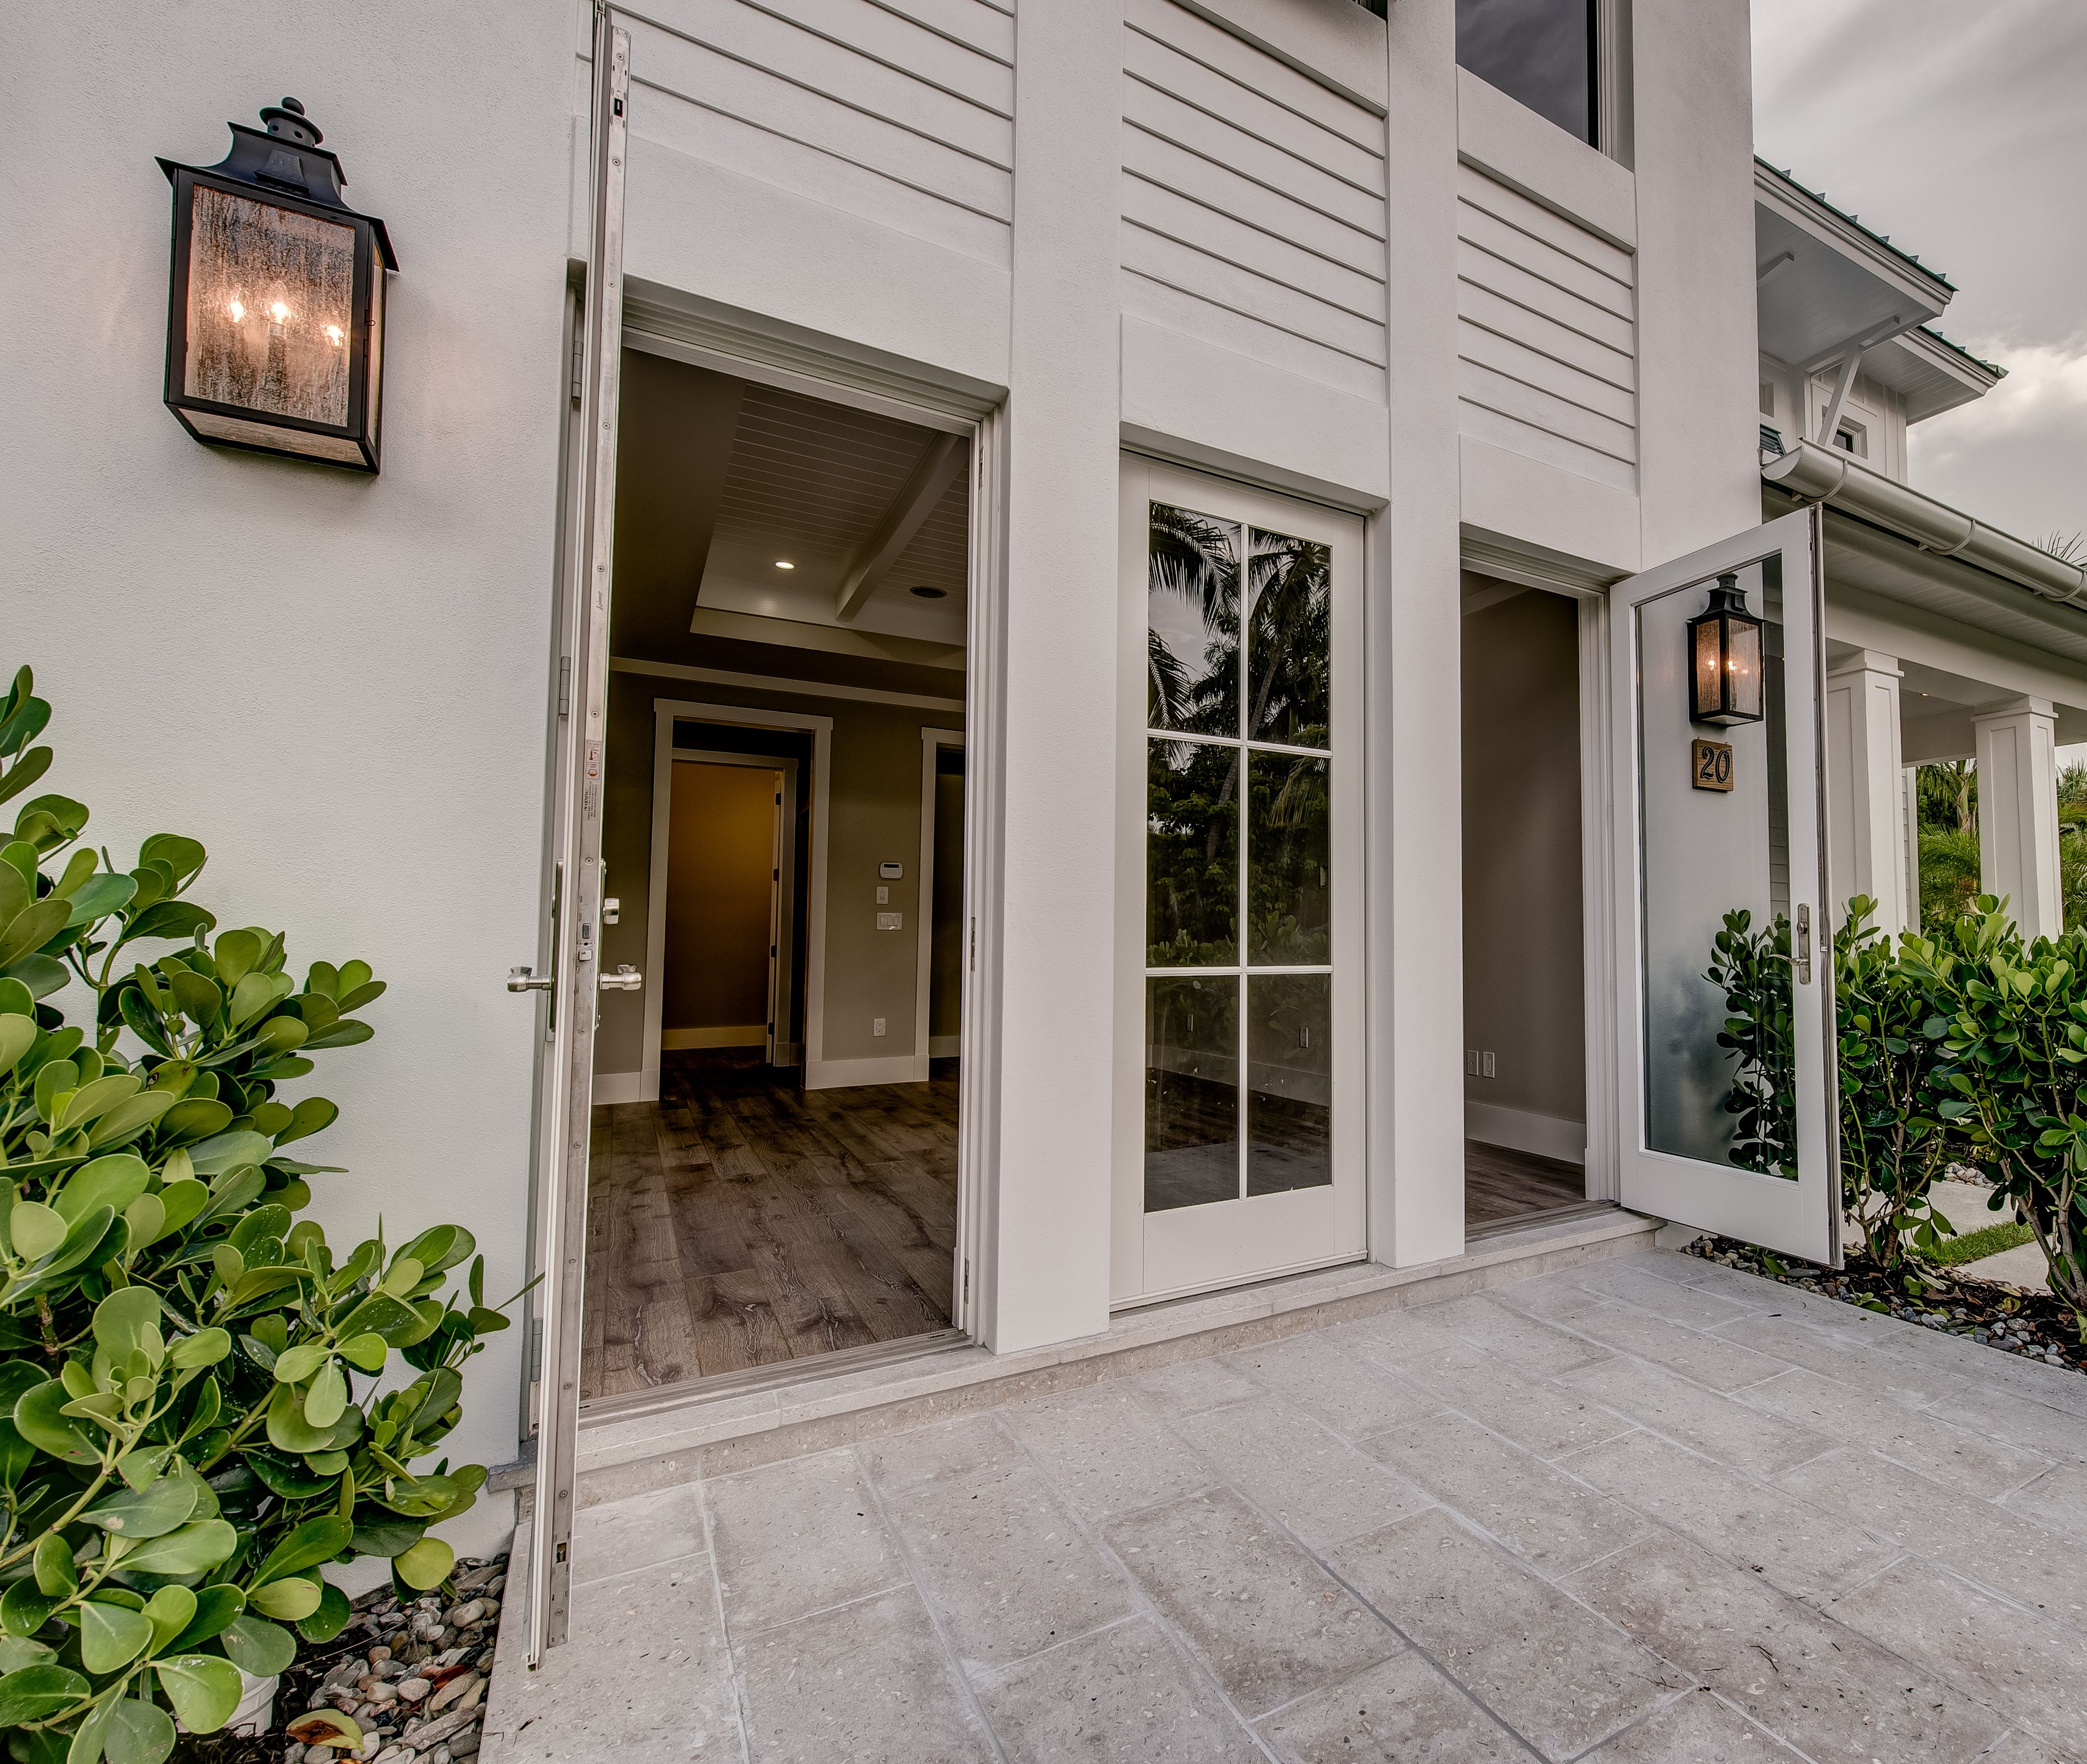 Outdoor Patio Design | My home design, Outdoor patio ... on My Patio Design id=61572